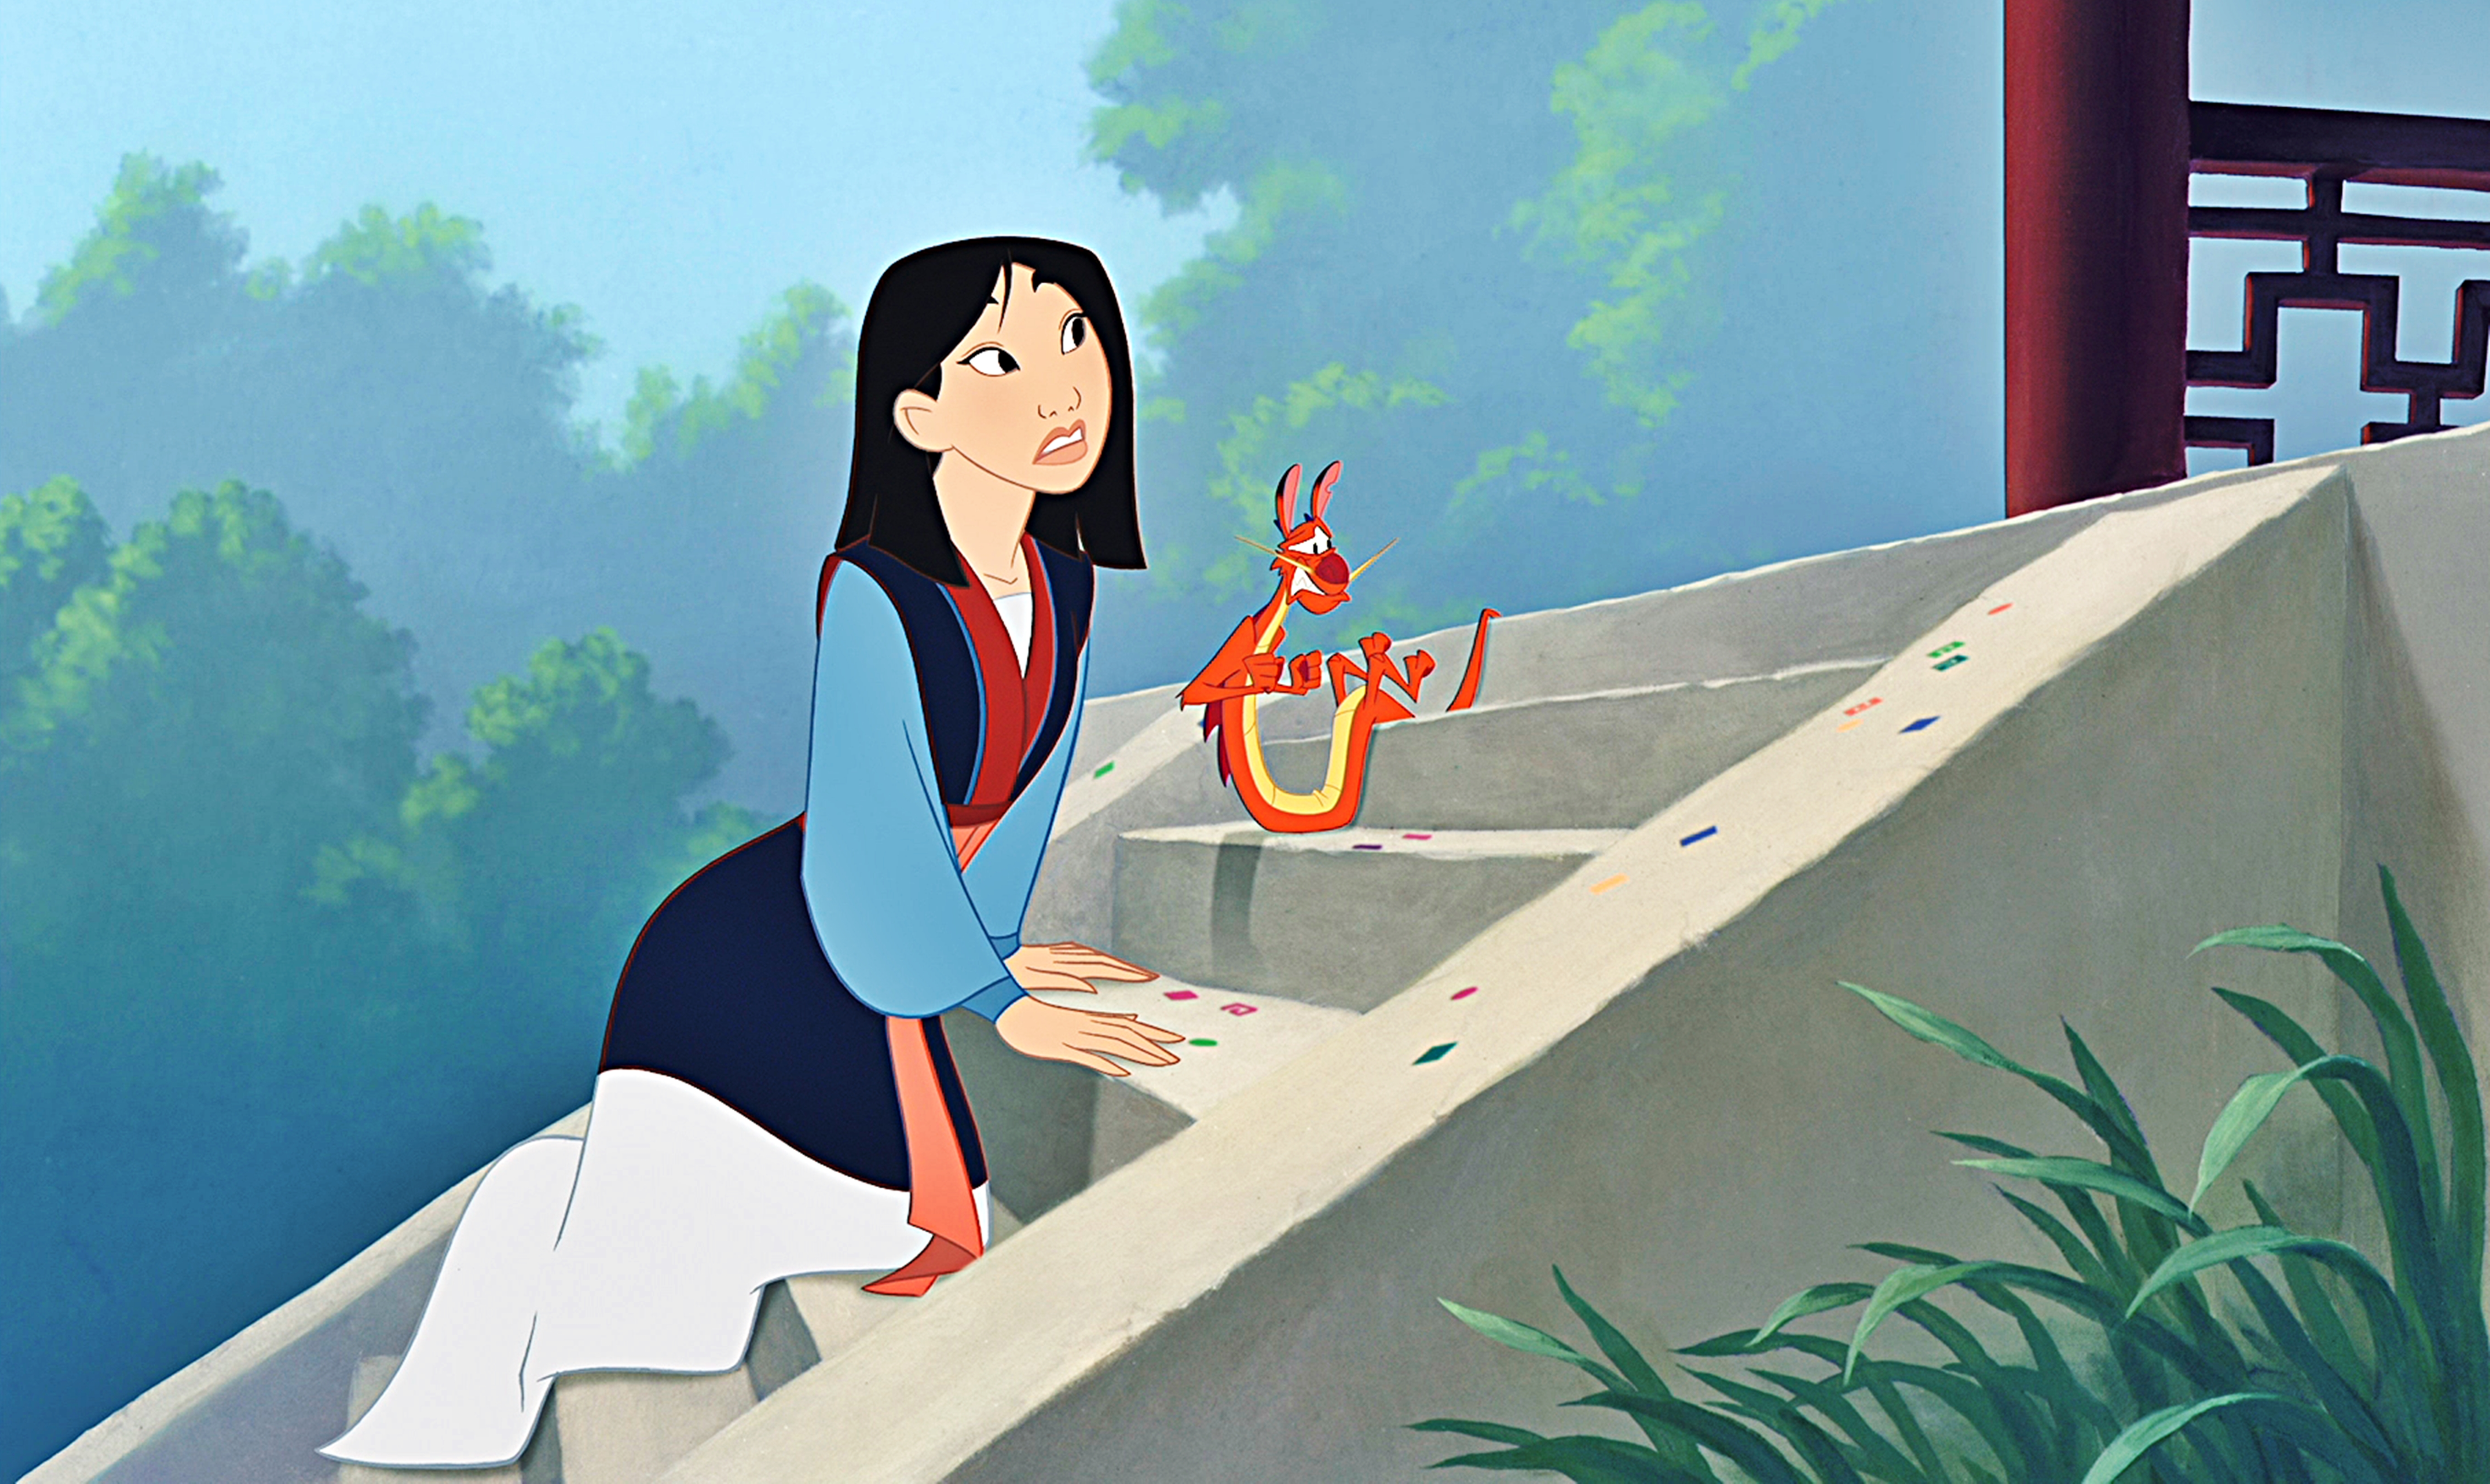 华特·迪士尼角色 images walt 迪士尼 screencaps - 花木兰 & mushu